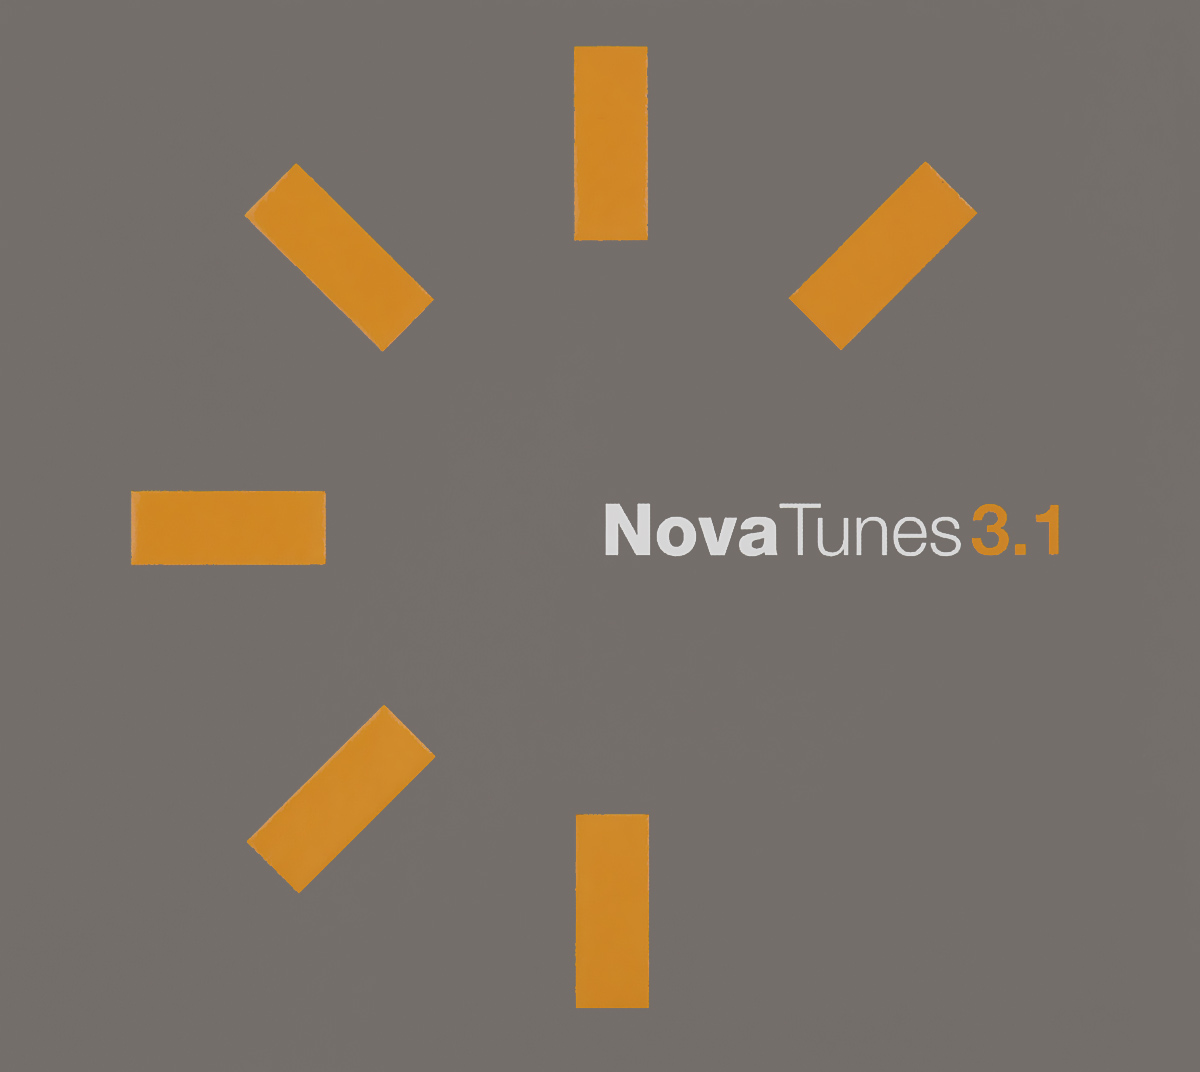 Nova Tunes 3.1 nova tunes 1 7